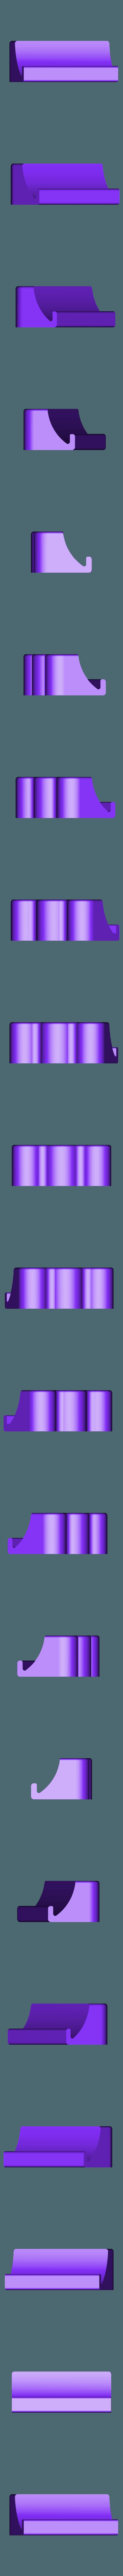 ipad-holder.STL Download free STL file Clamp for iPad 4 on a tripod • 3D printing model, perinski